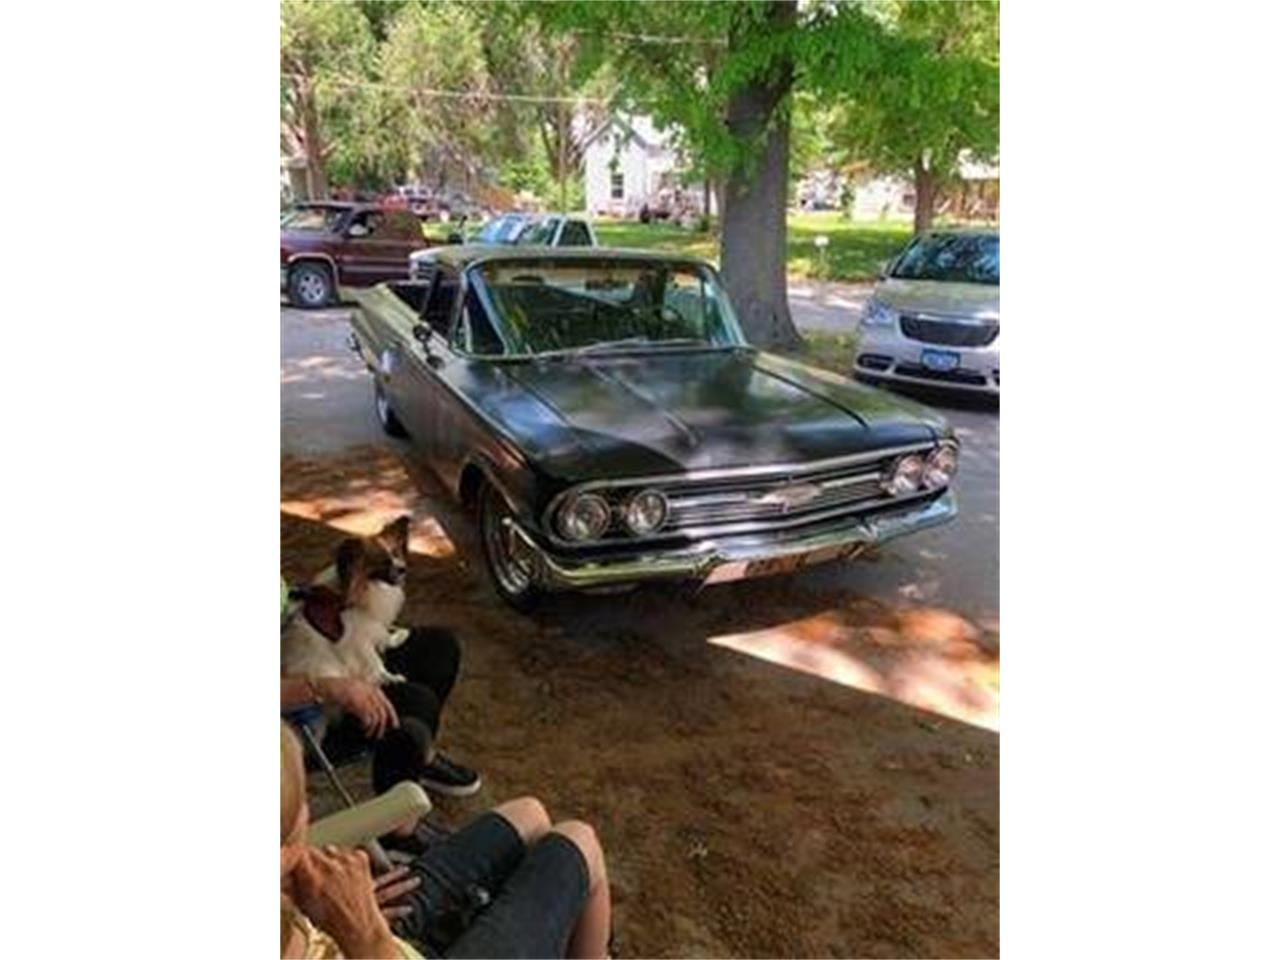 Large Picture of 1960 Chevrolet El Camino located in Shenandoah Iowa - $18,500.00 - QUMB